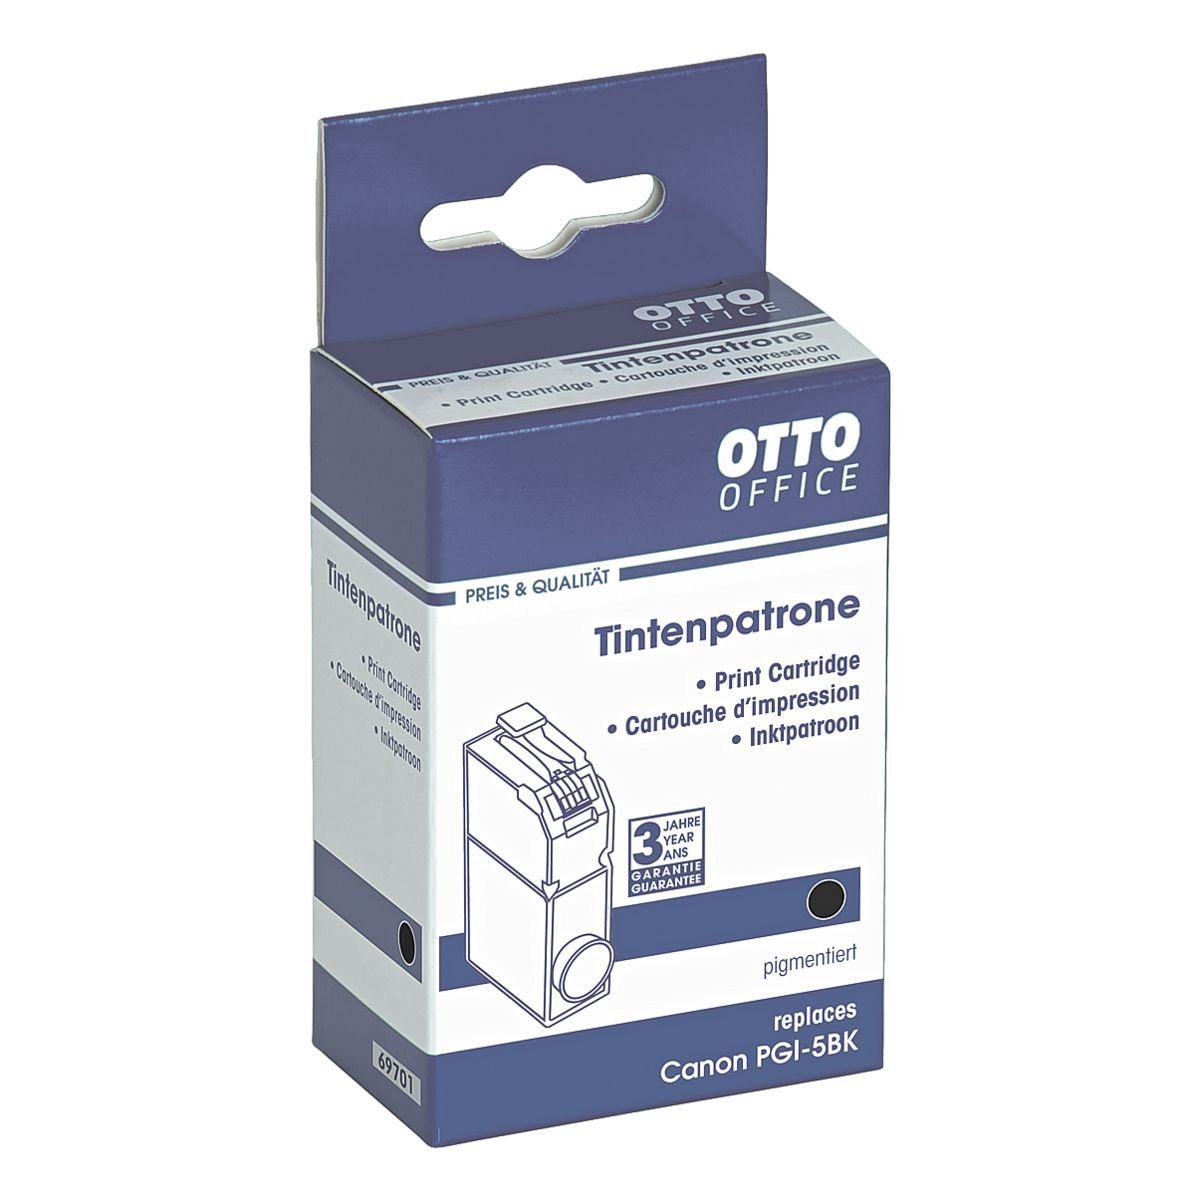 OTTO Office Tintenpatrone ersetzt Canon »PGI-5BK«